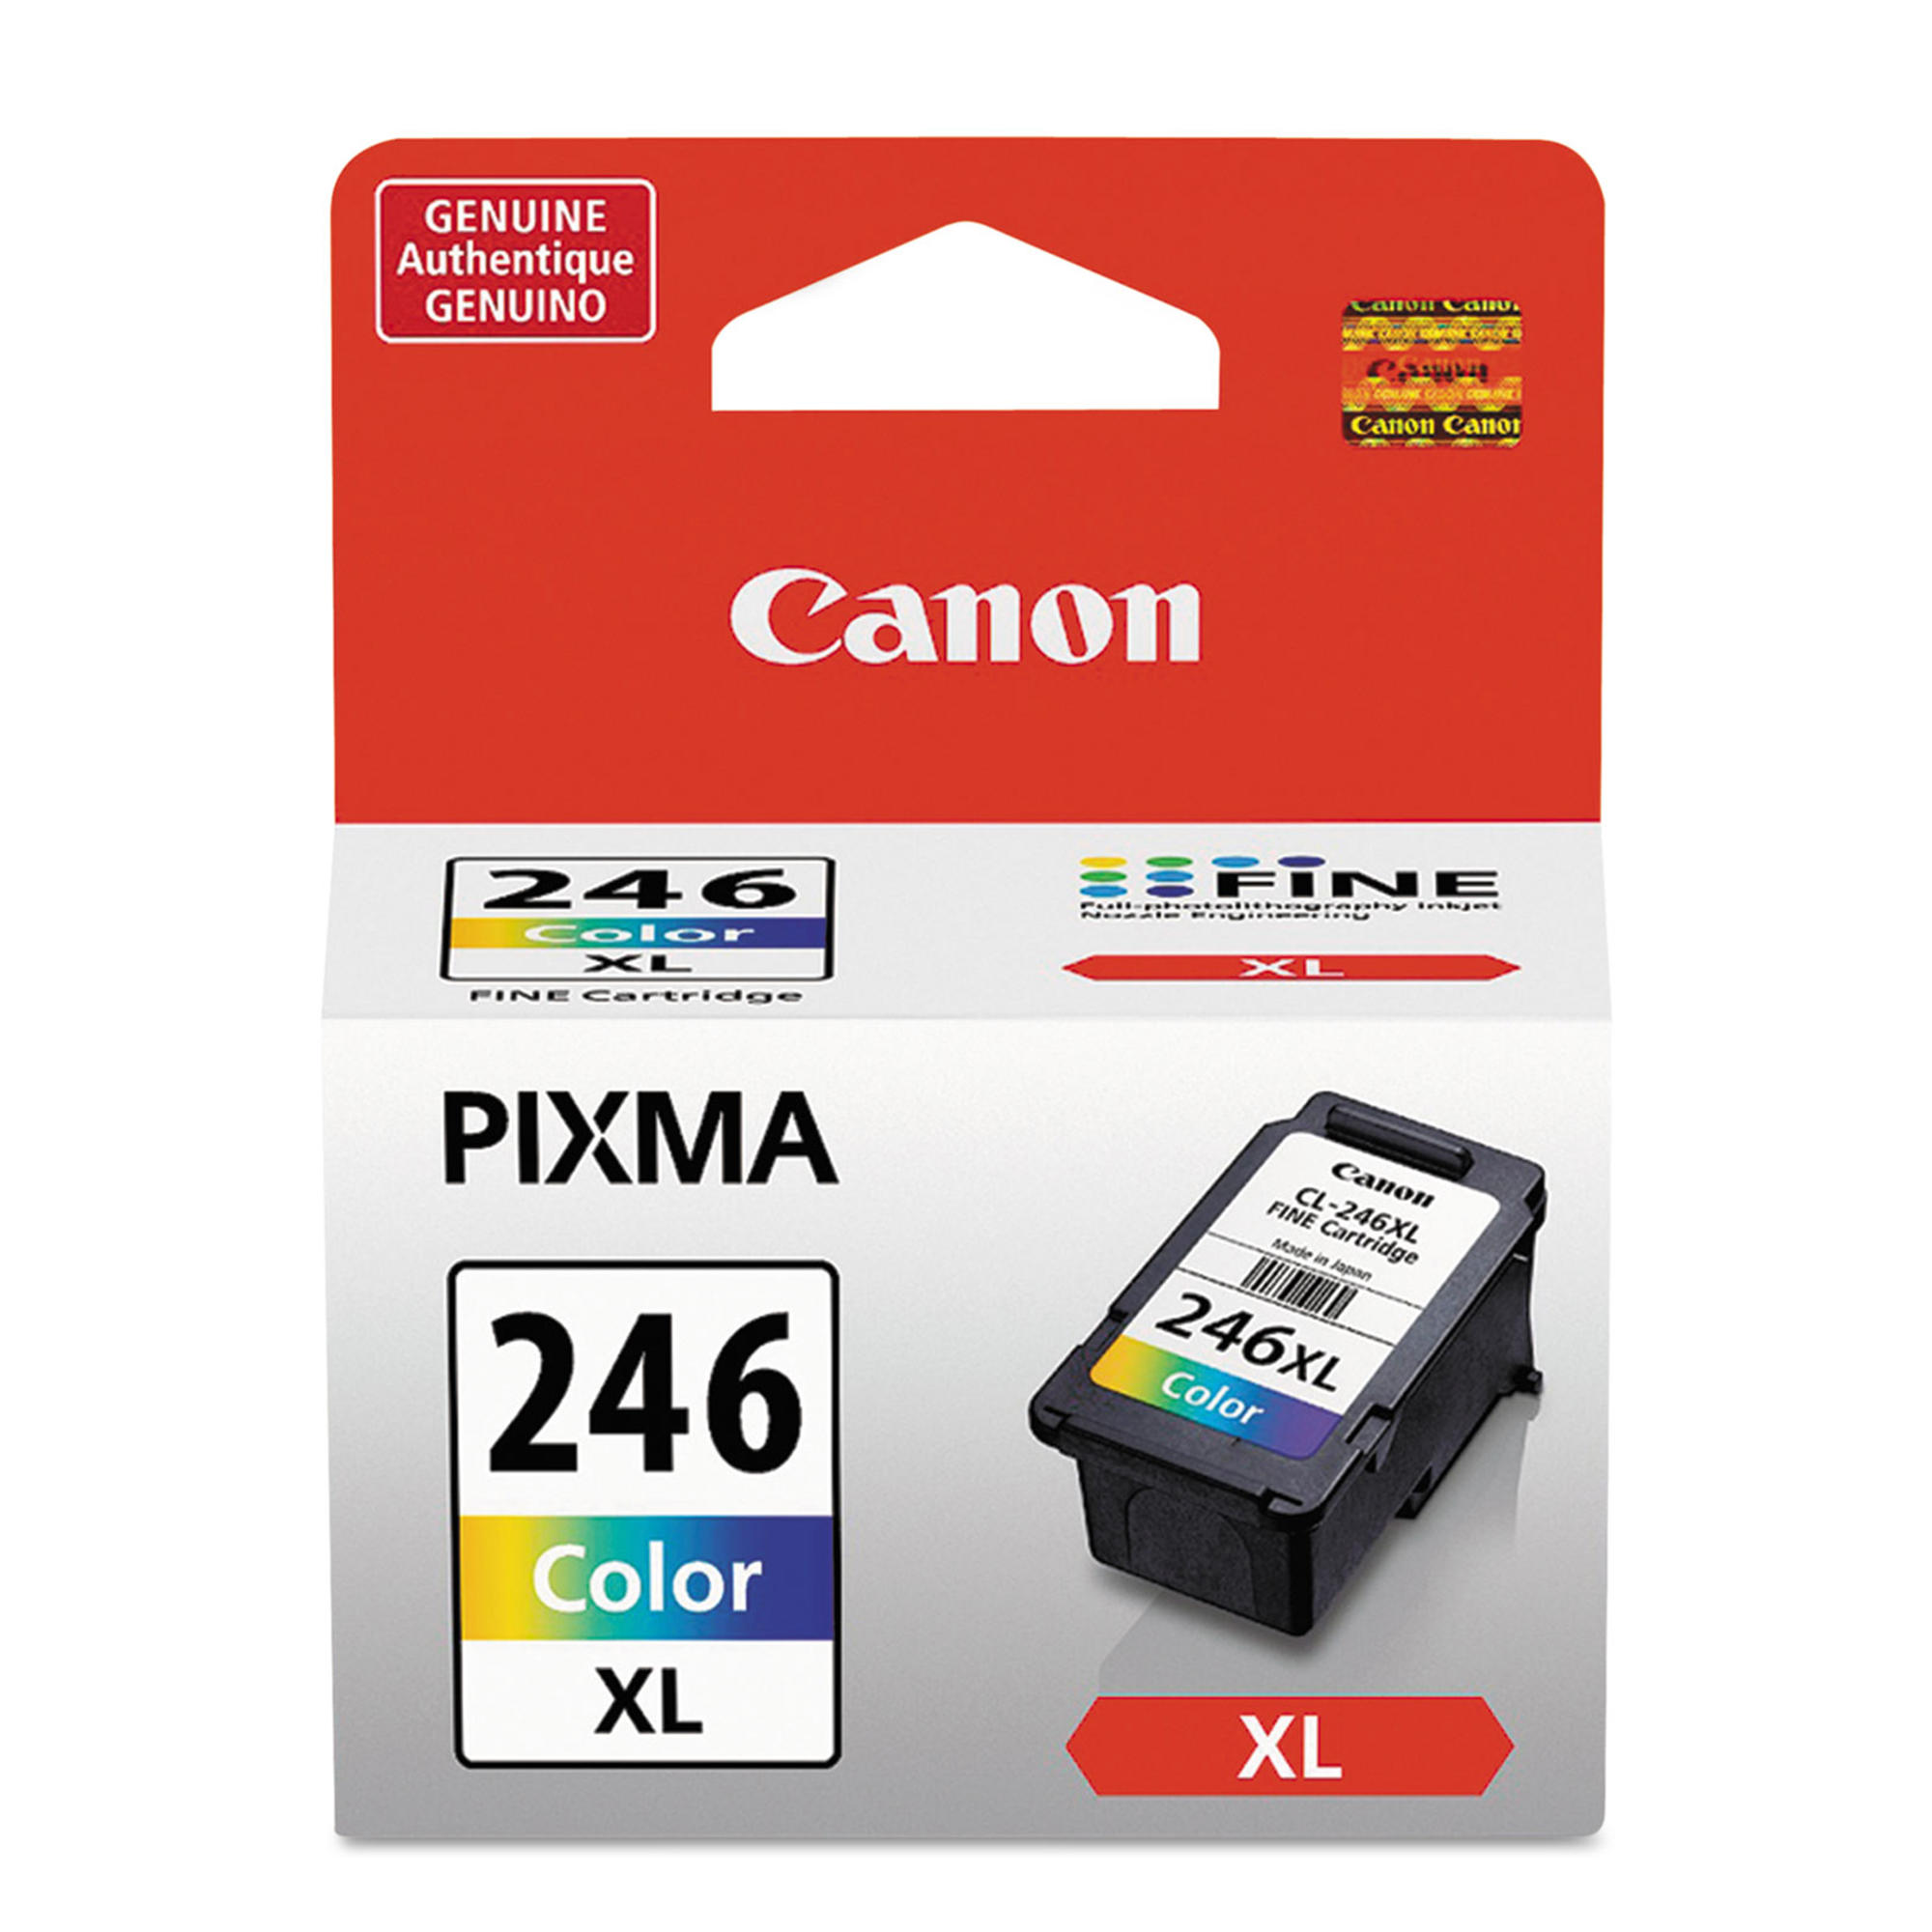 Canon CL246XL Original Color Ink Cartridge High Yield (8280B001)